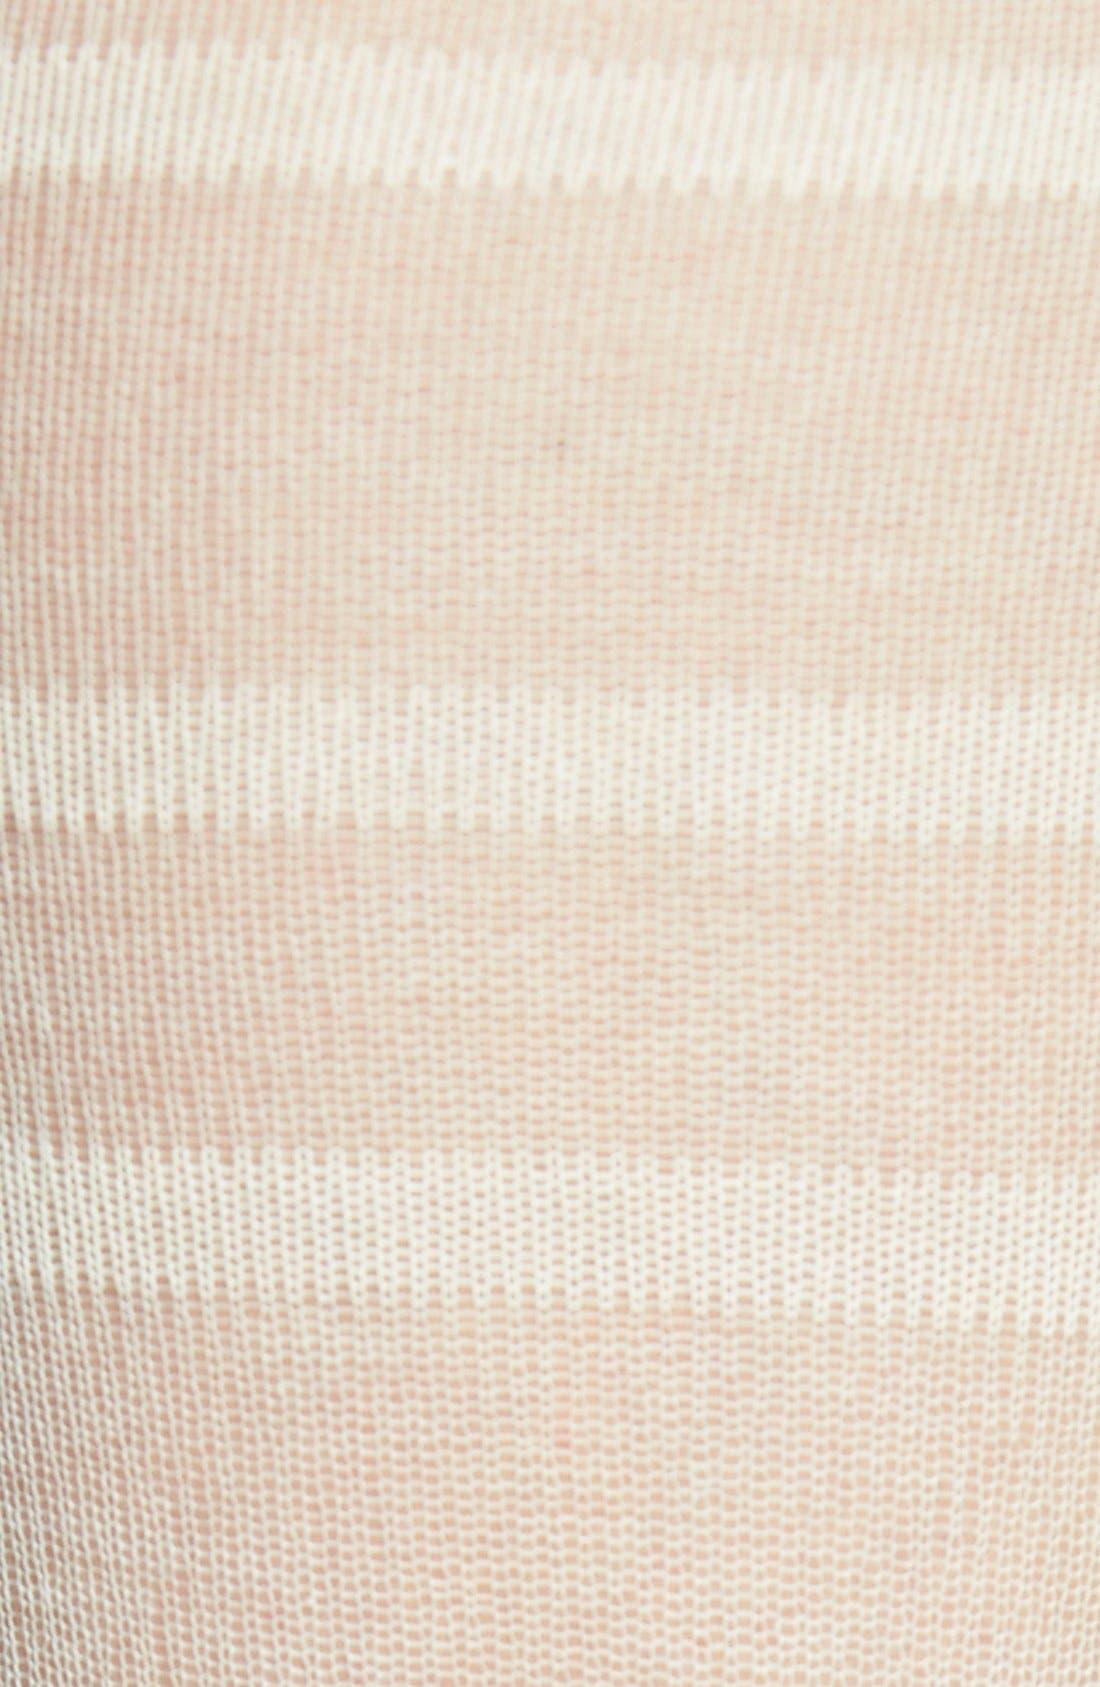 Alternate Image 2  - Oroblu 'Calzino Nellie' Sheer Stripe Trouser Socks